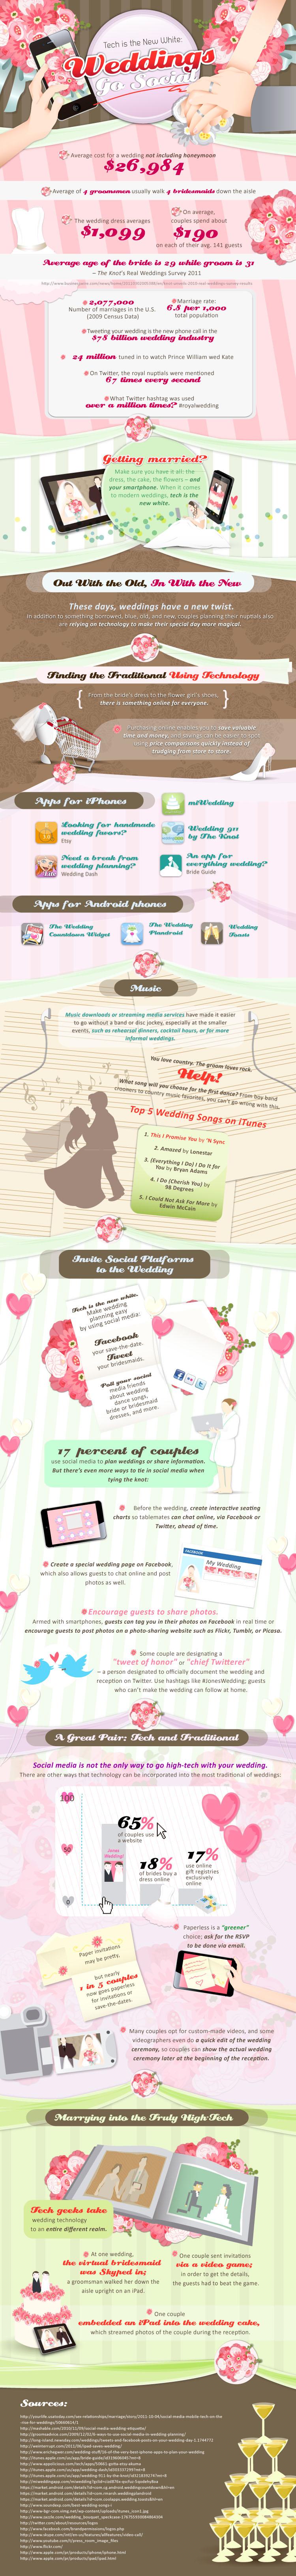 Wedding go social